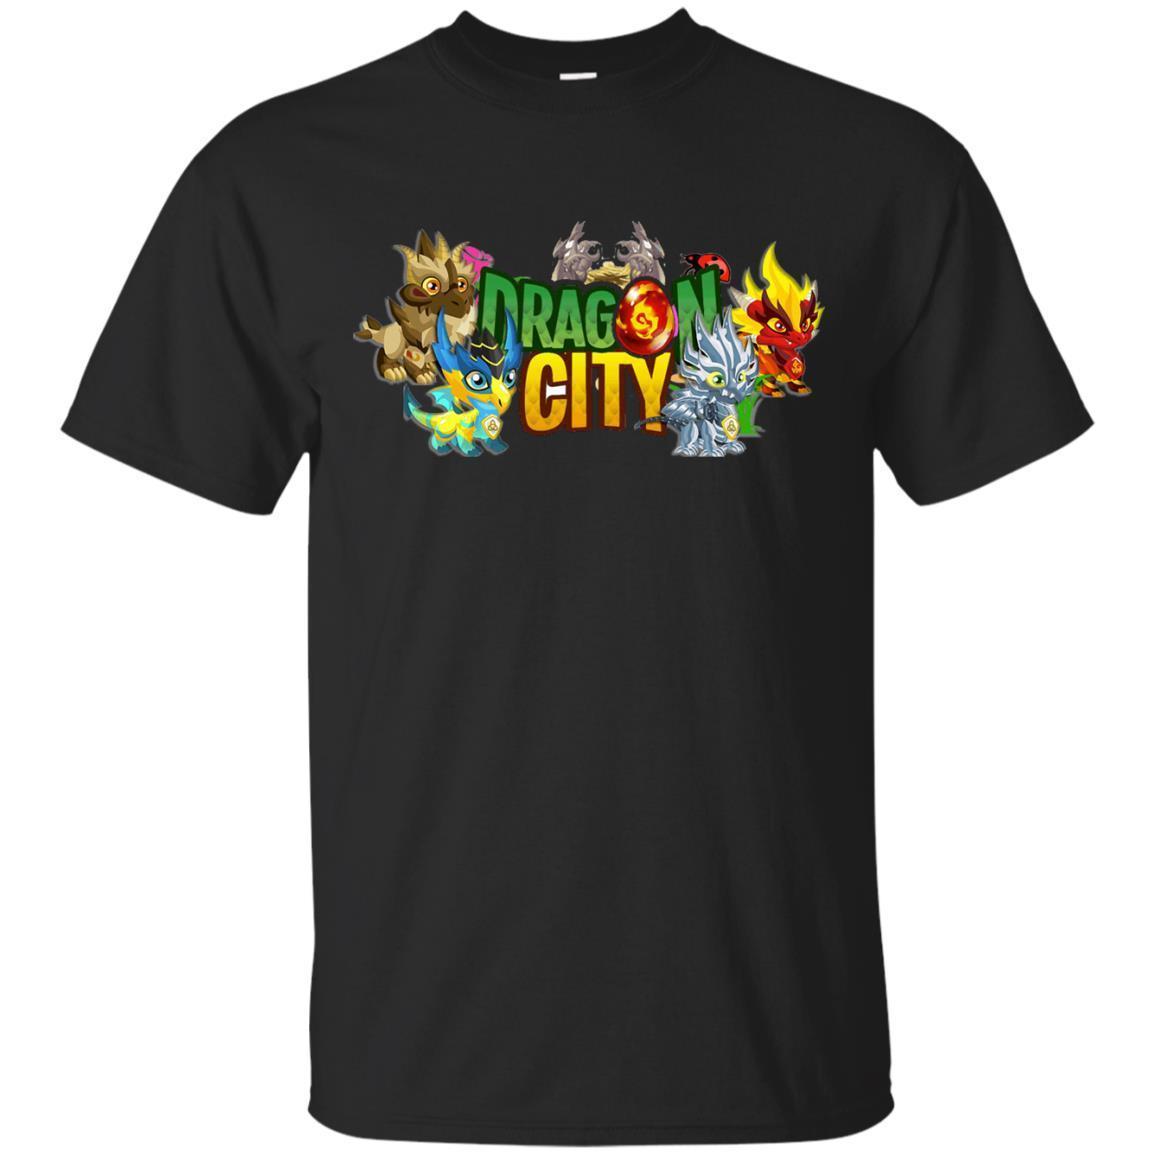 Dragon And City T-Shirt